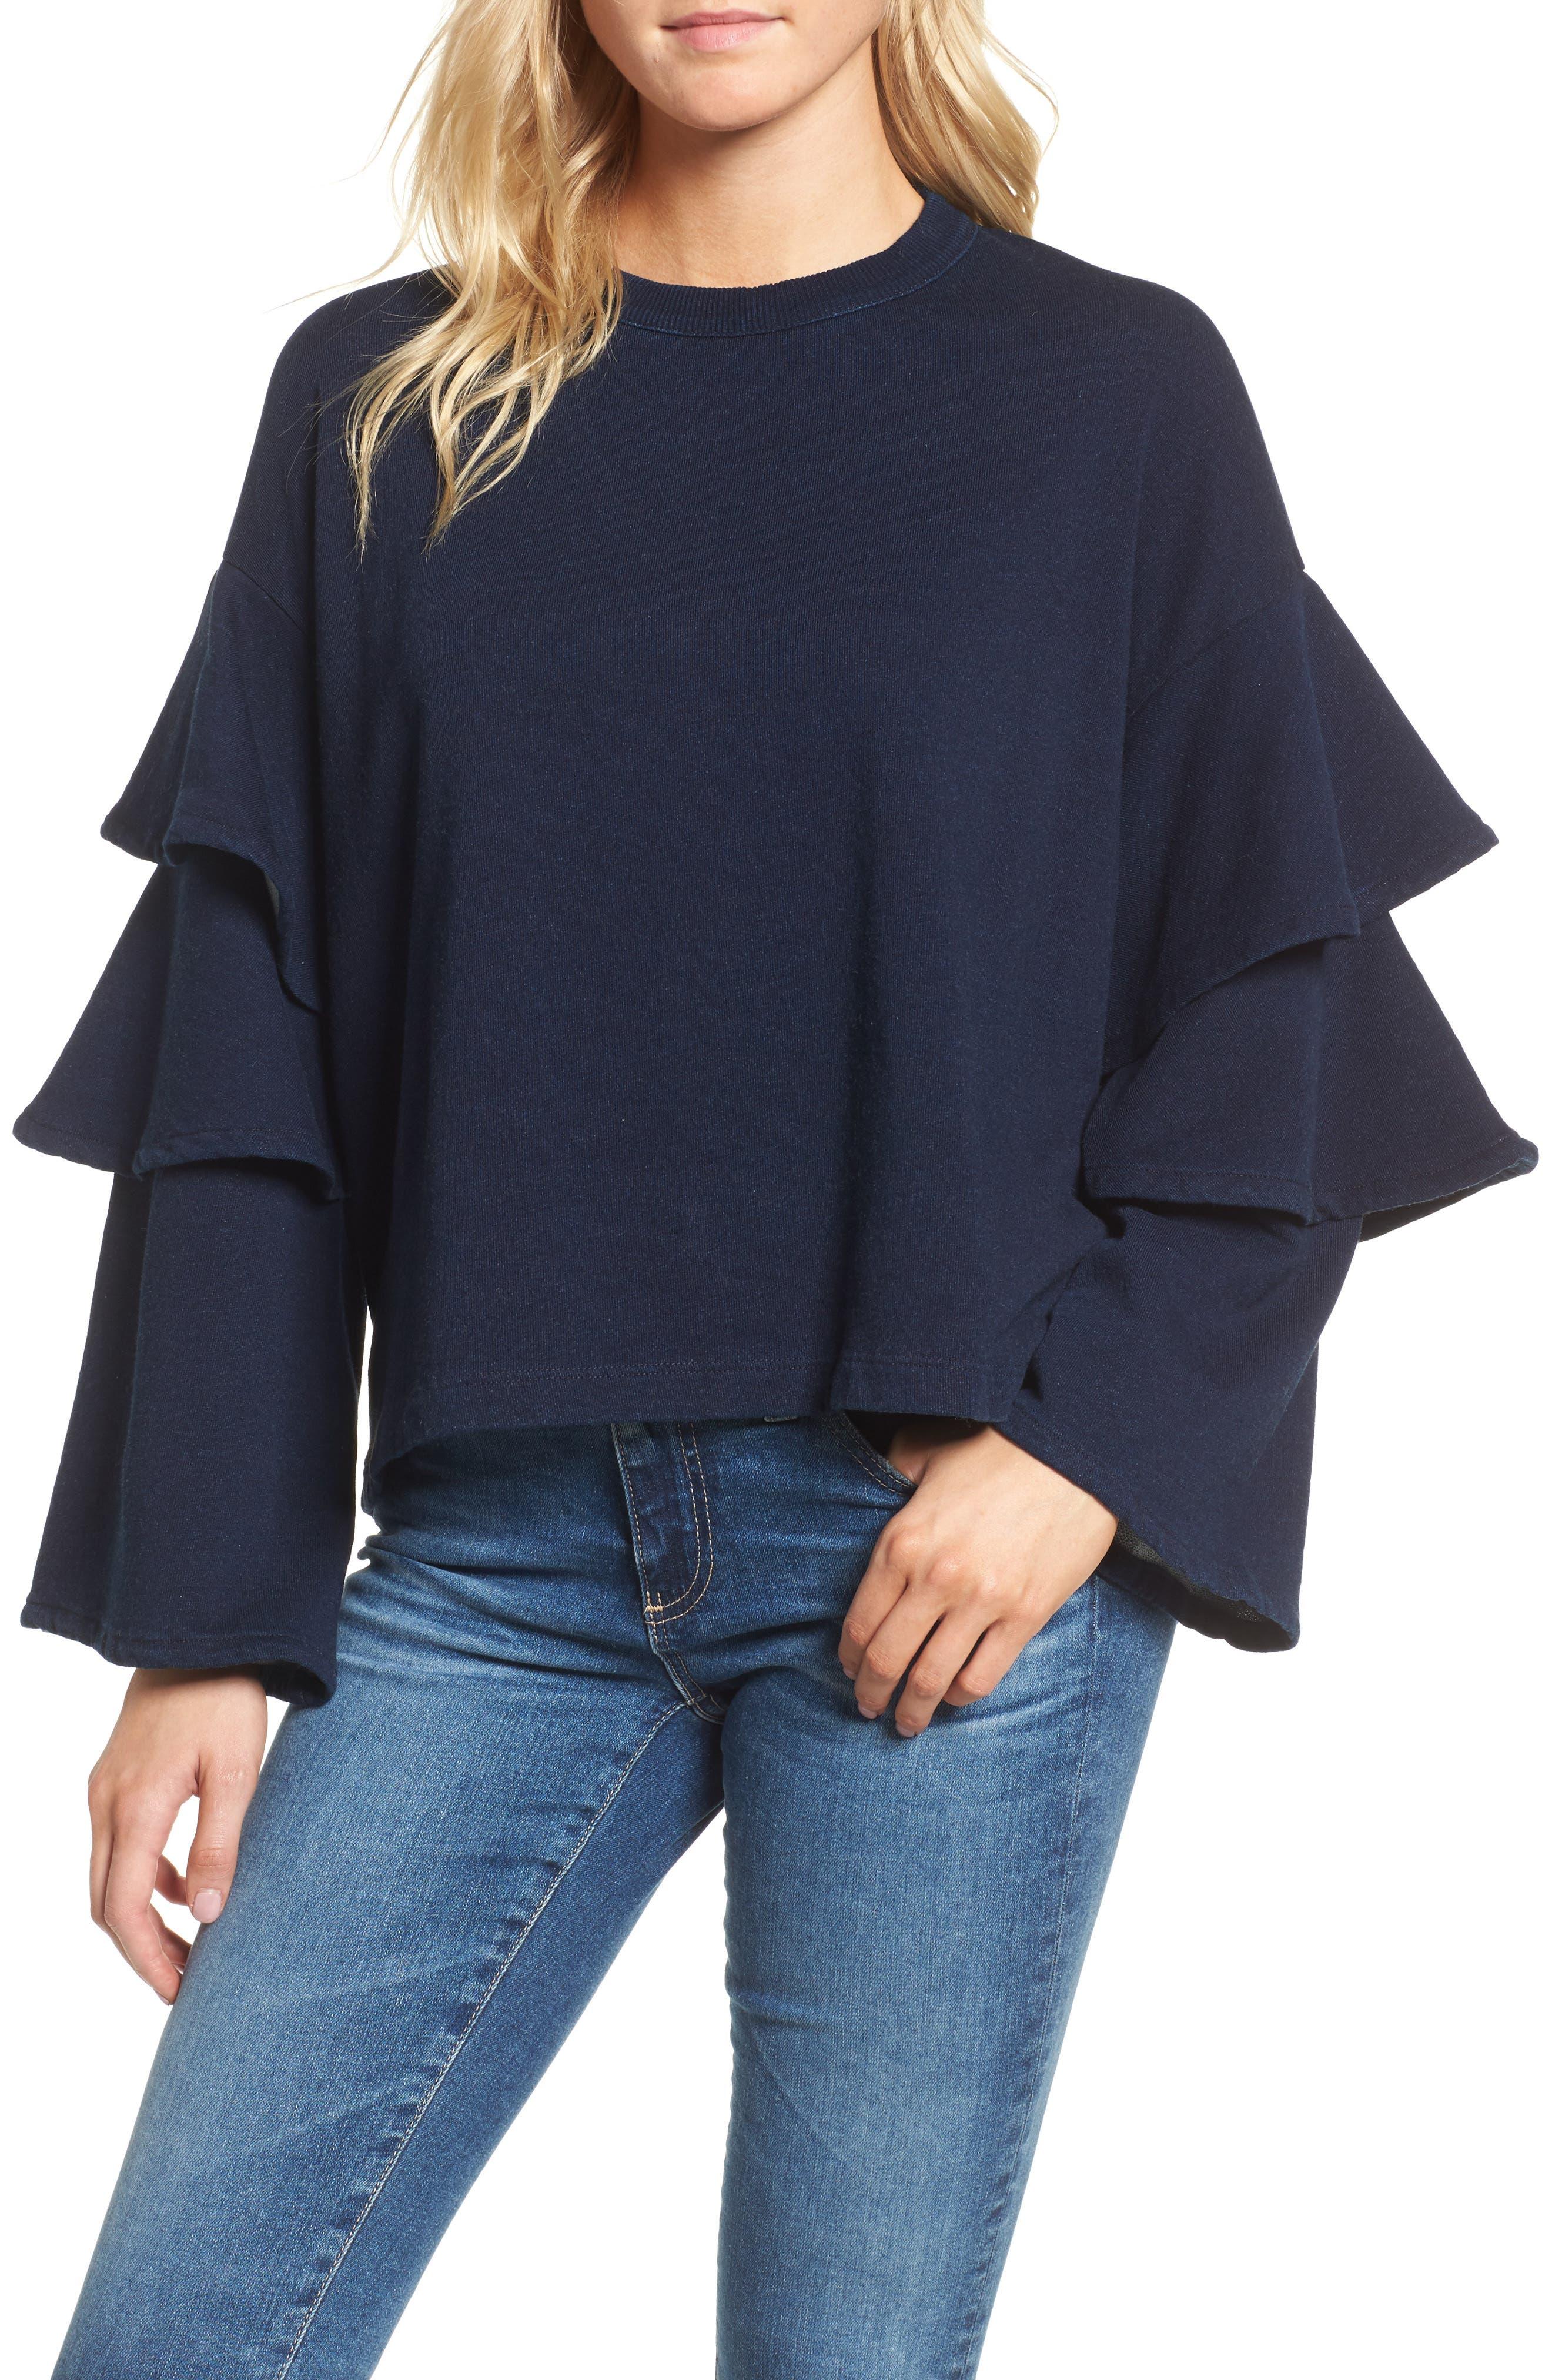 Pearl Ruffle Sweatshirt,                             Main thumbnail 1, color,                             Dark Indigo